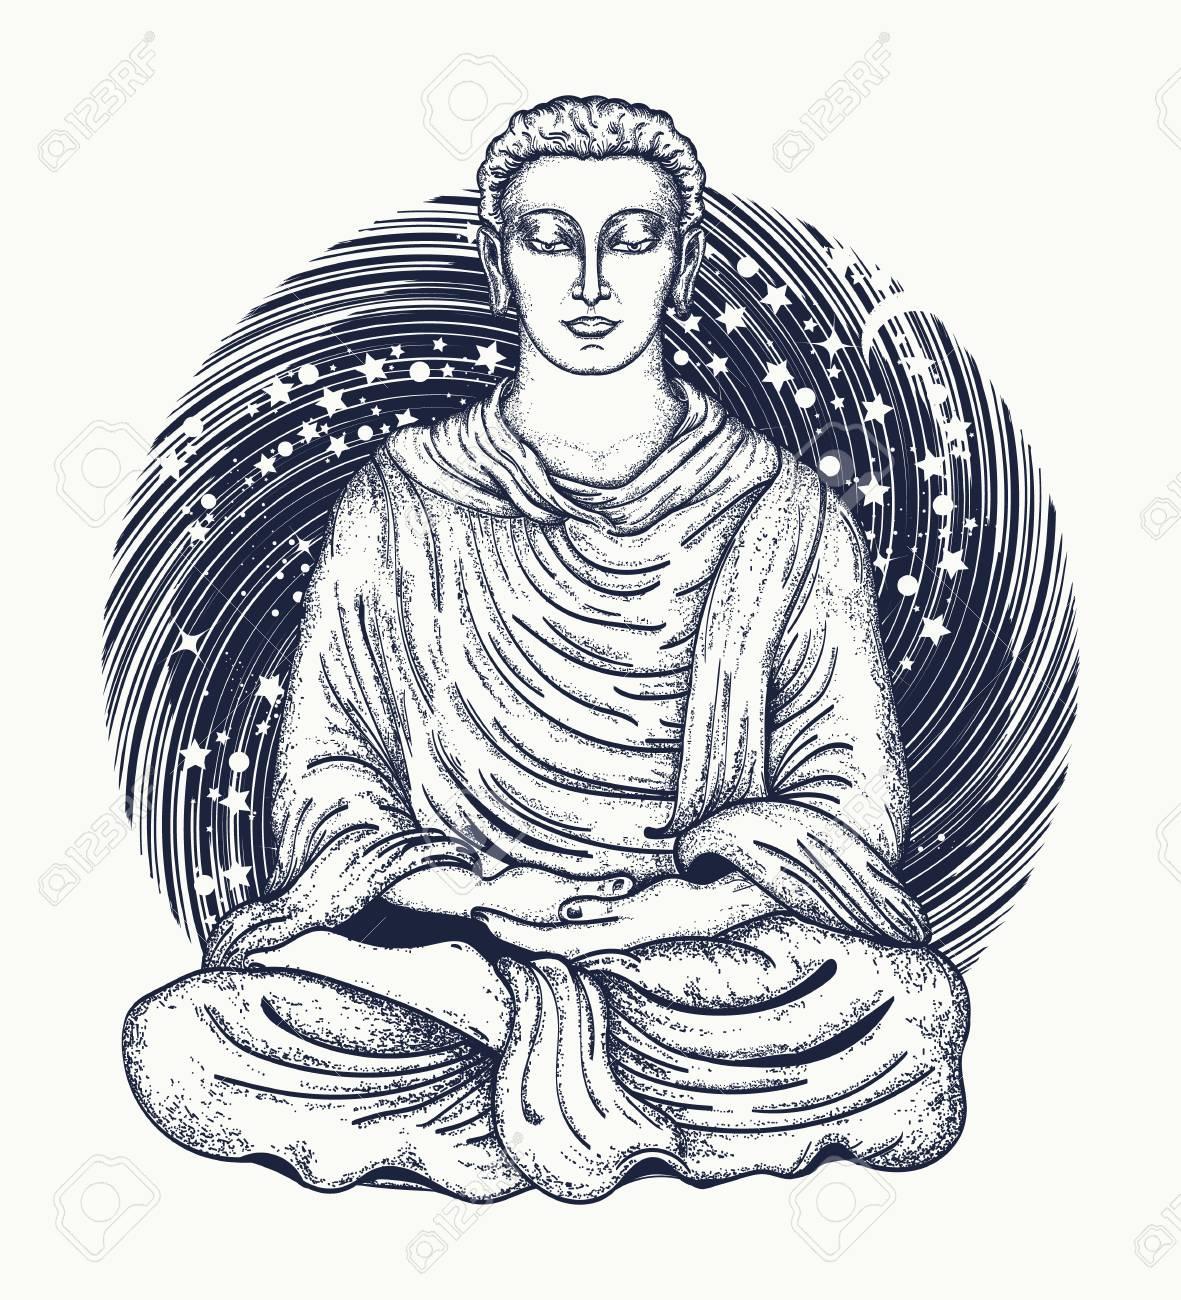 1181x1300 Space Buddha Tattoo Art. Religious Symbol Of Harmony, Spirituality